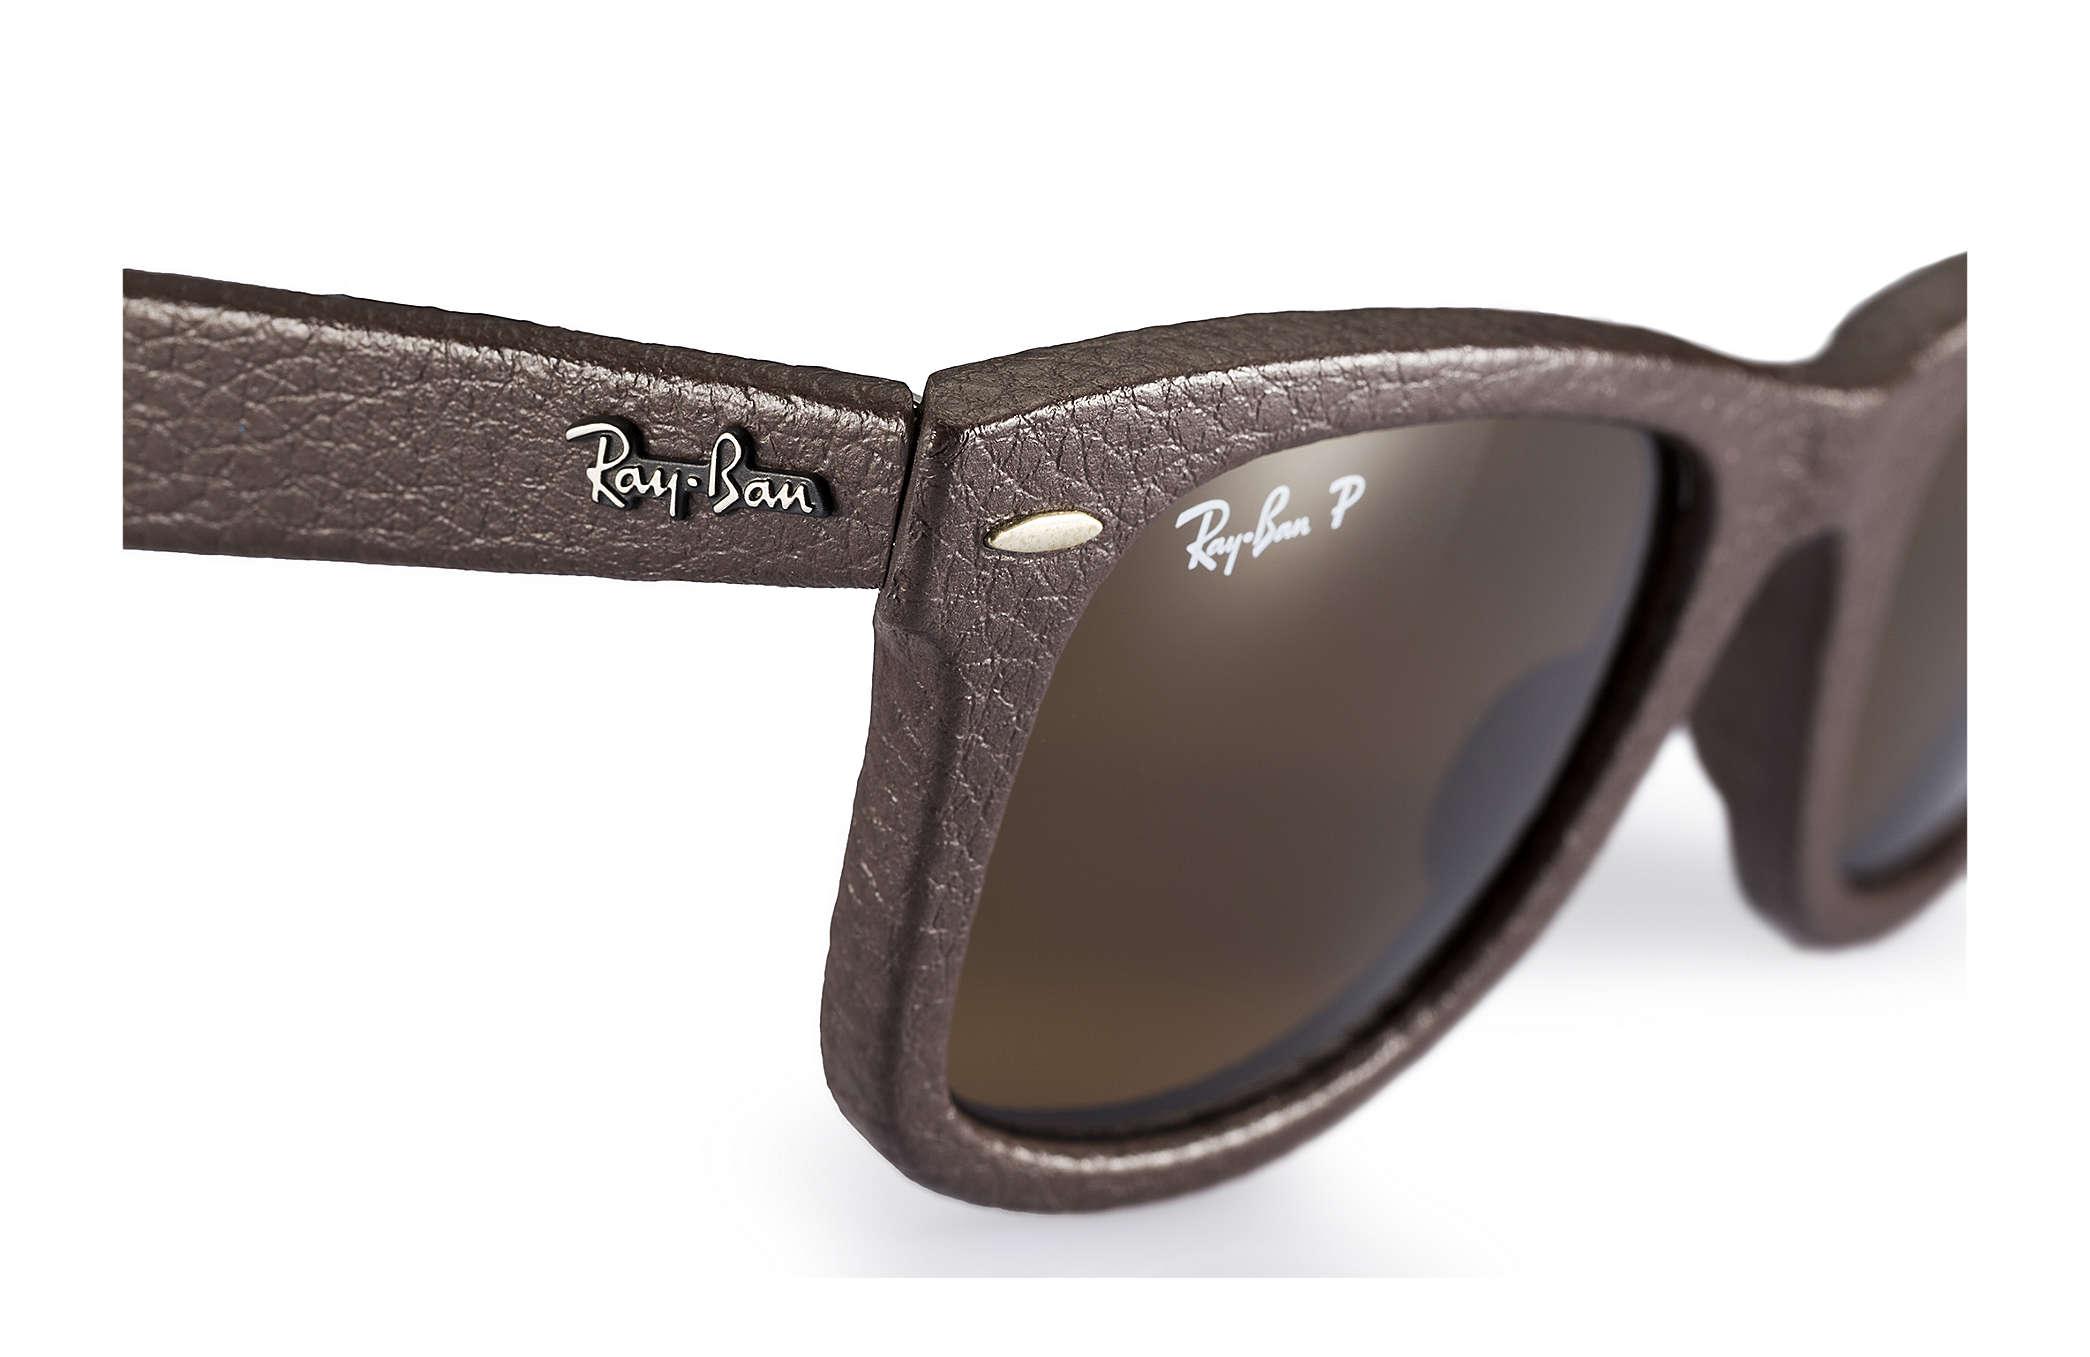 ray ban aviator leather sunglasses